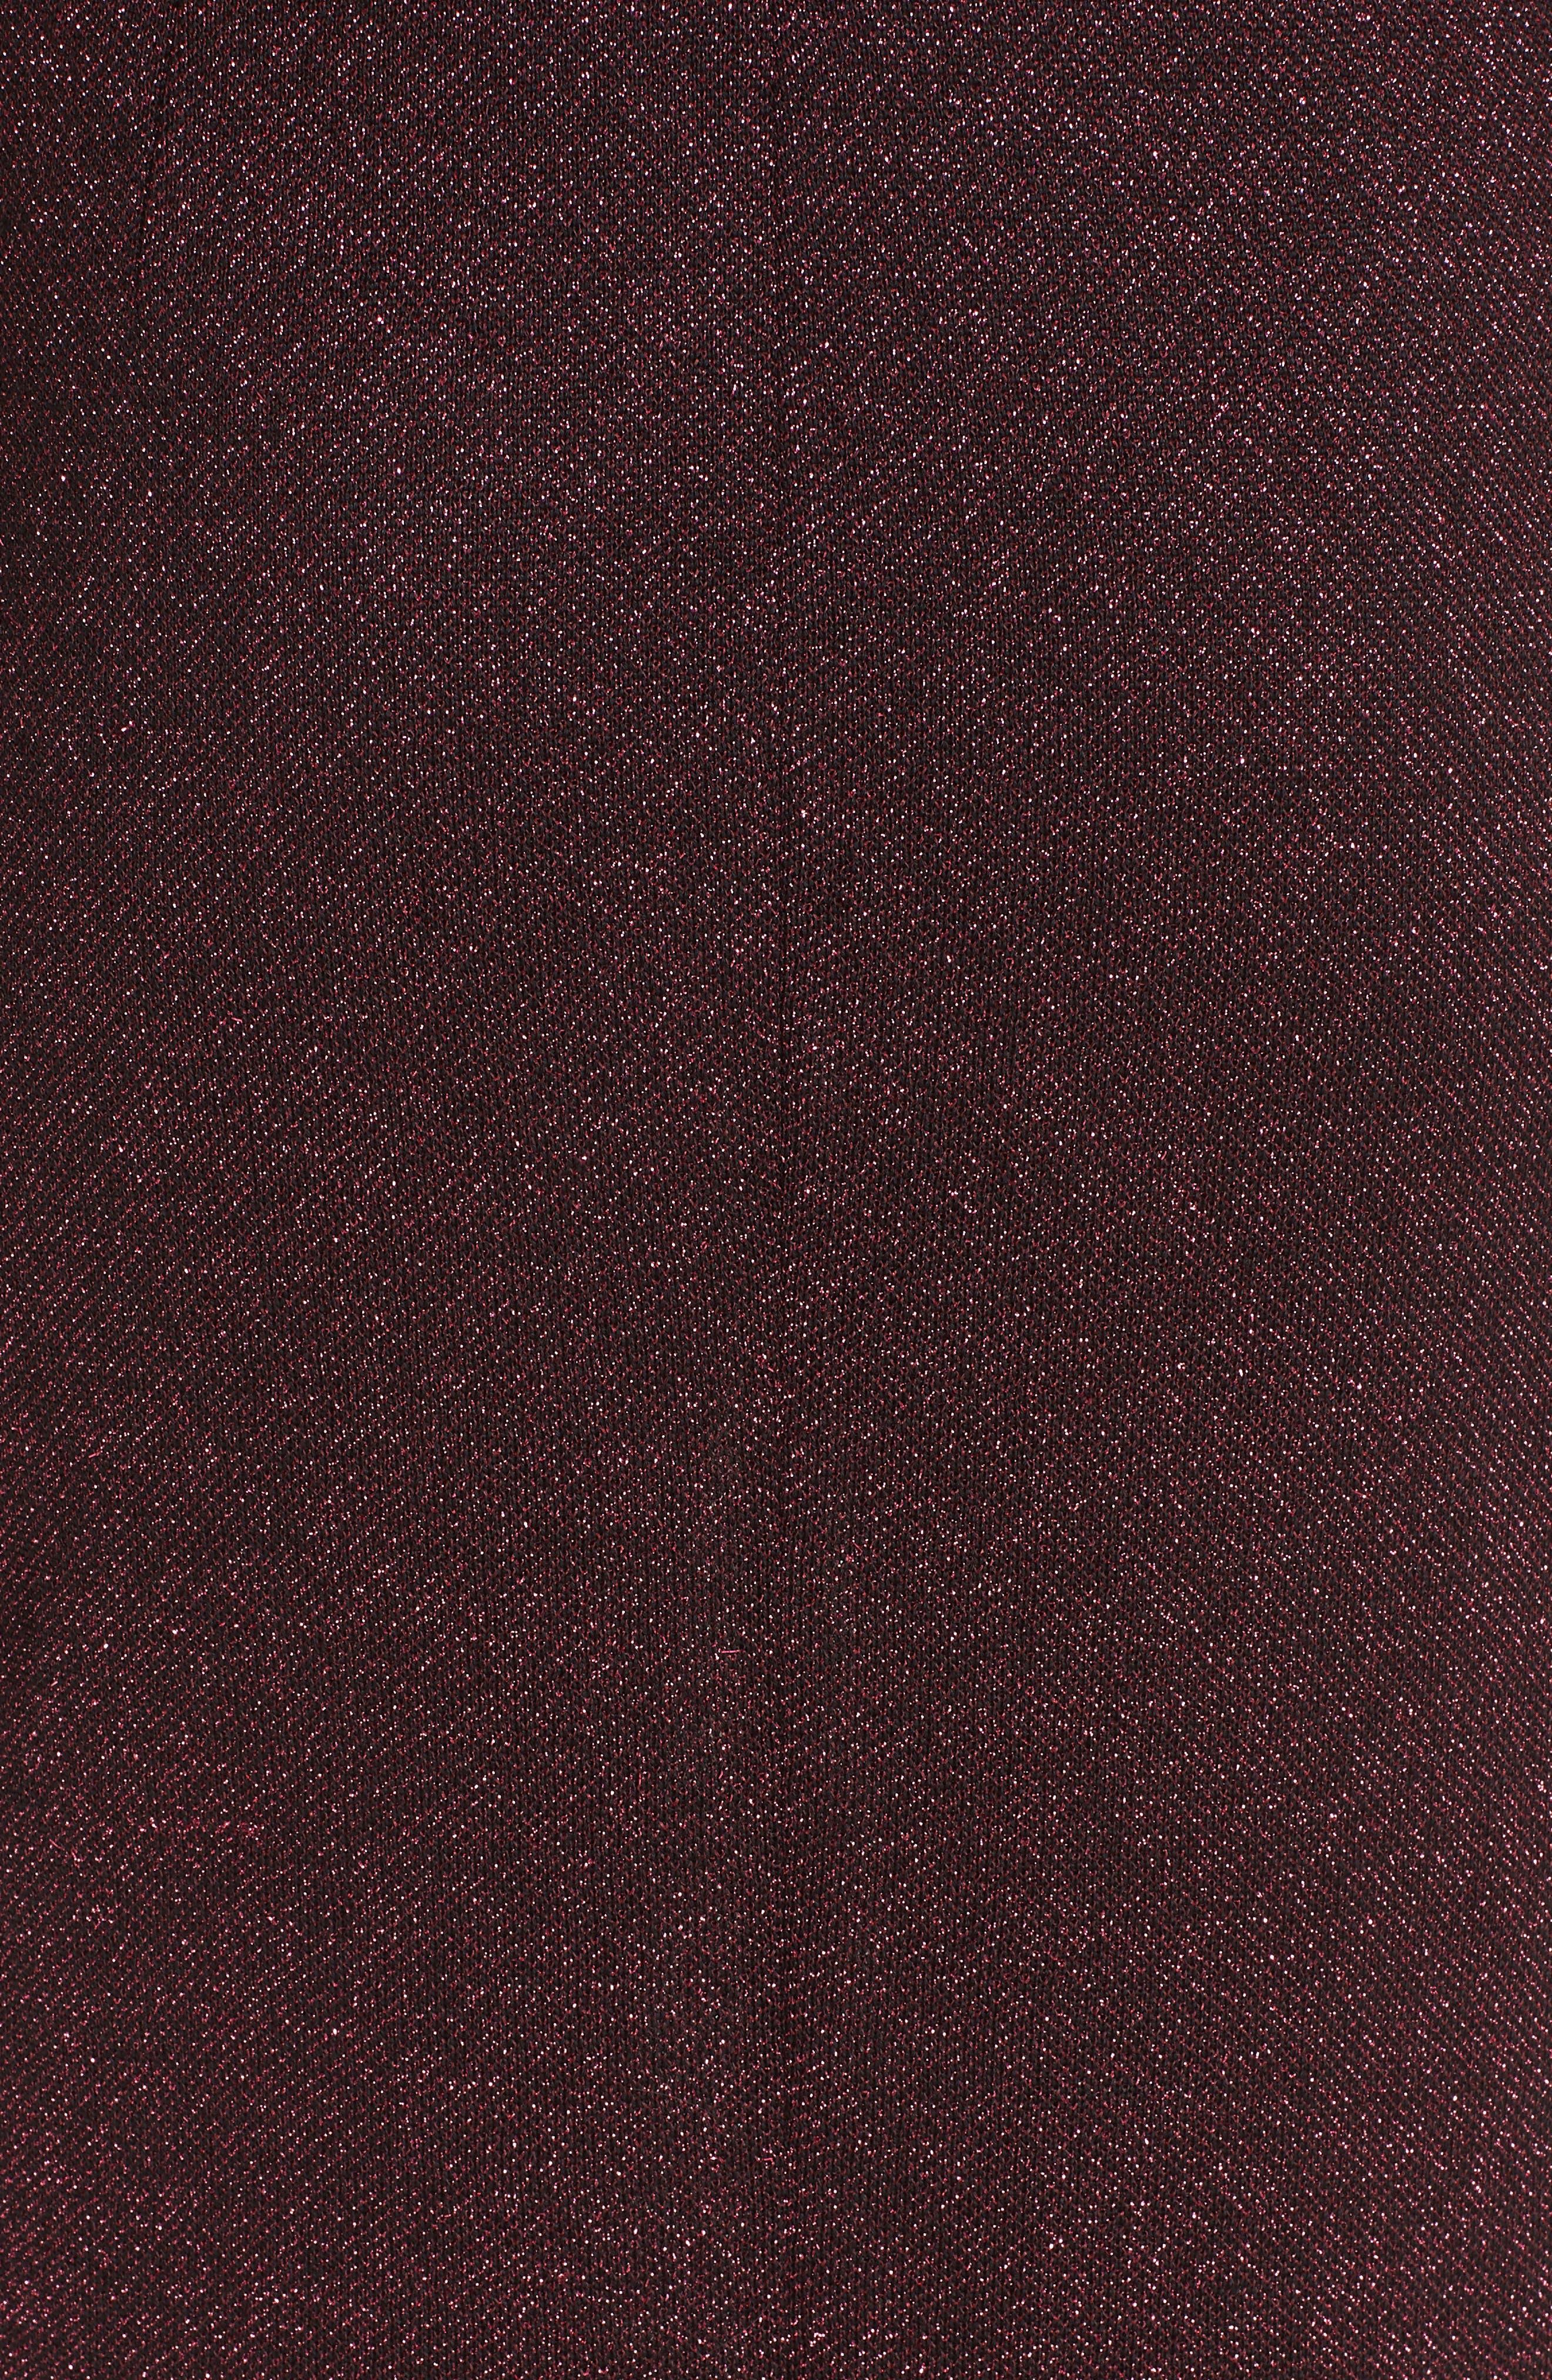 Mod Metallic Knit Sheath Dress,                             Alternate thumbnail 6, color,                             DARK PINK MULTI